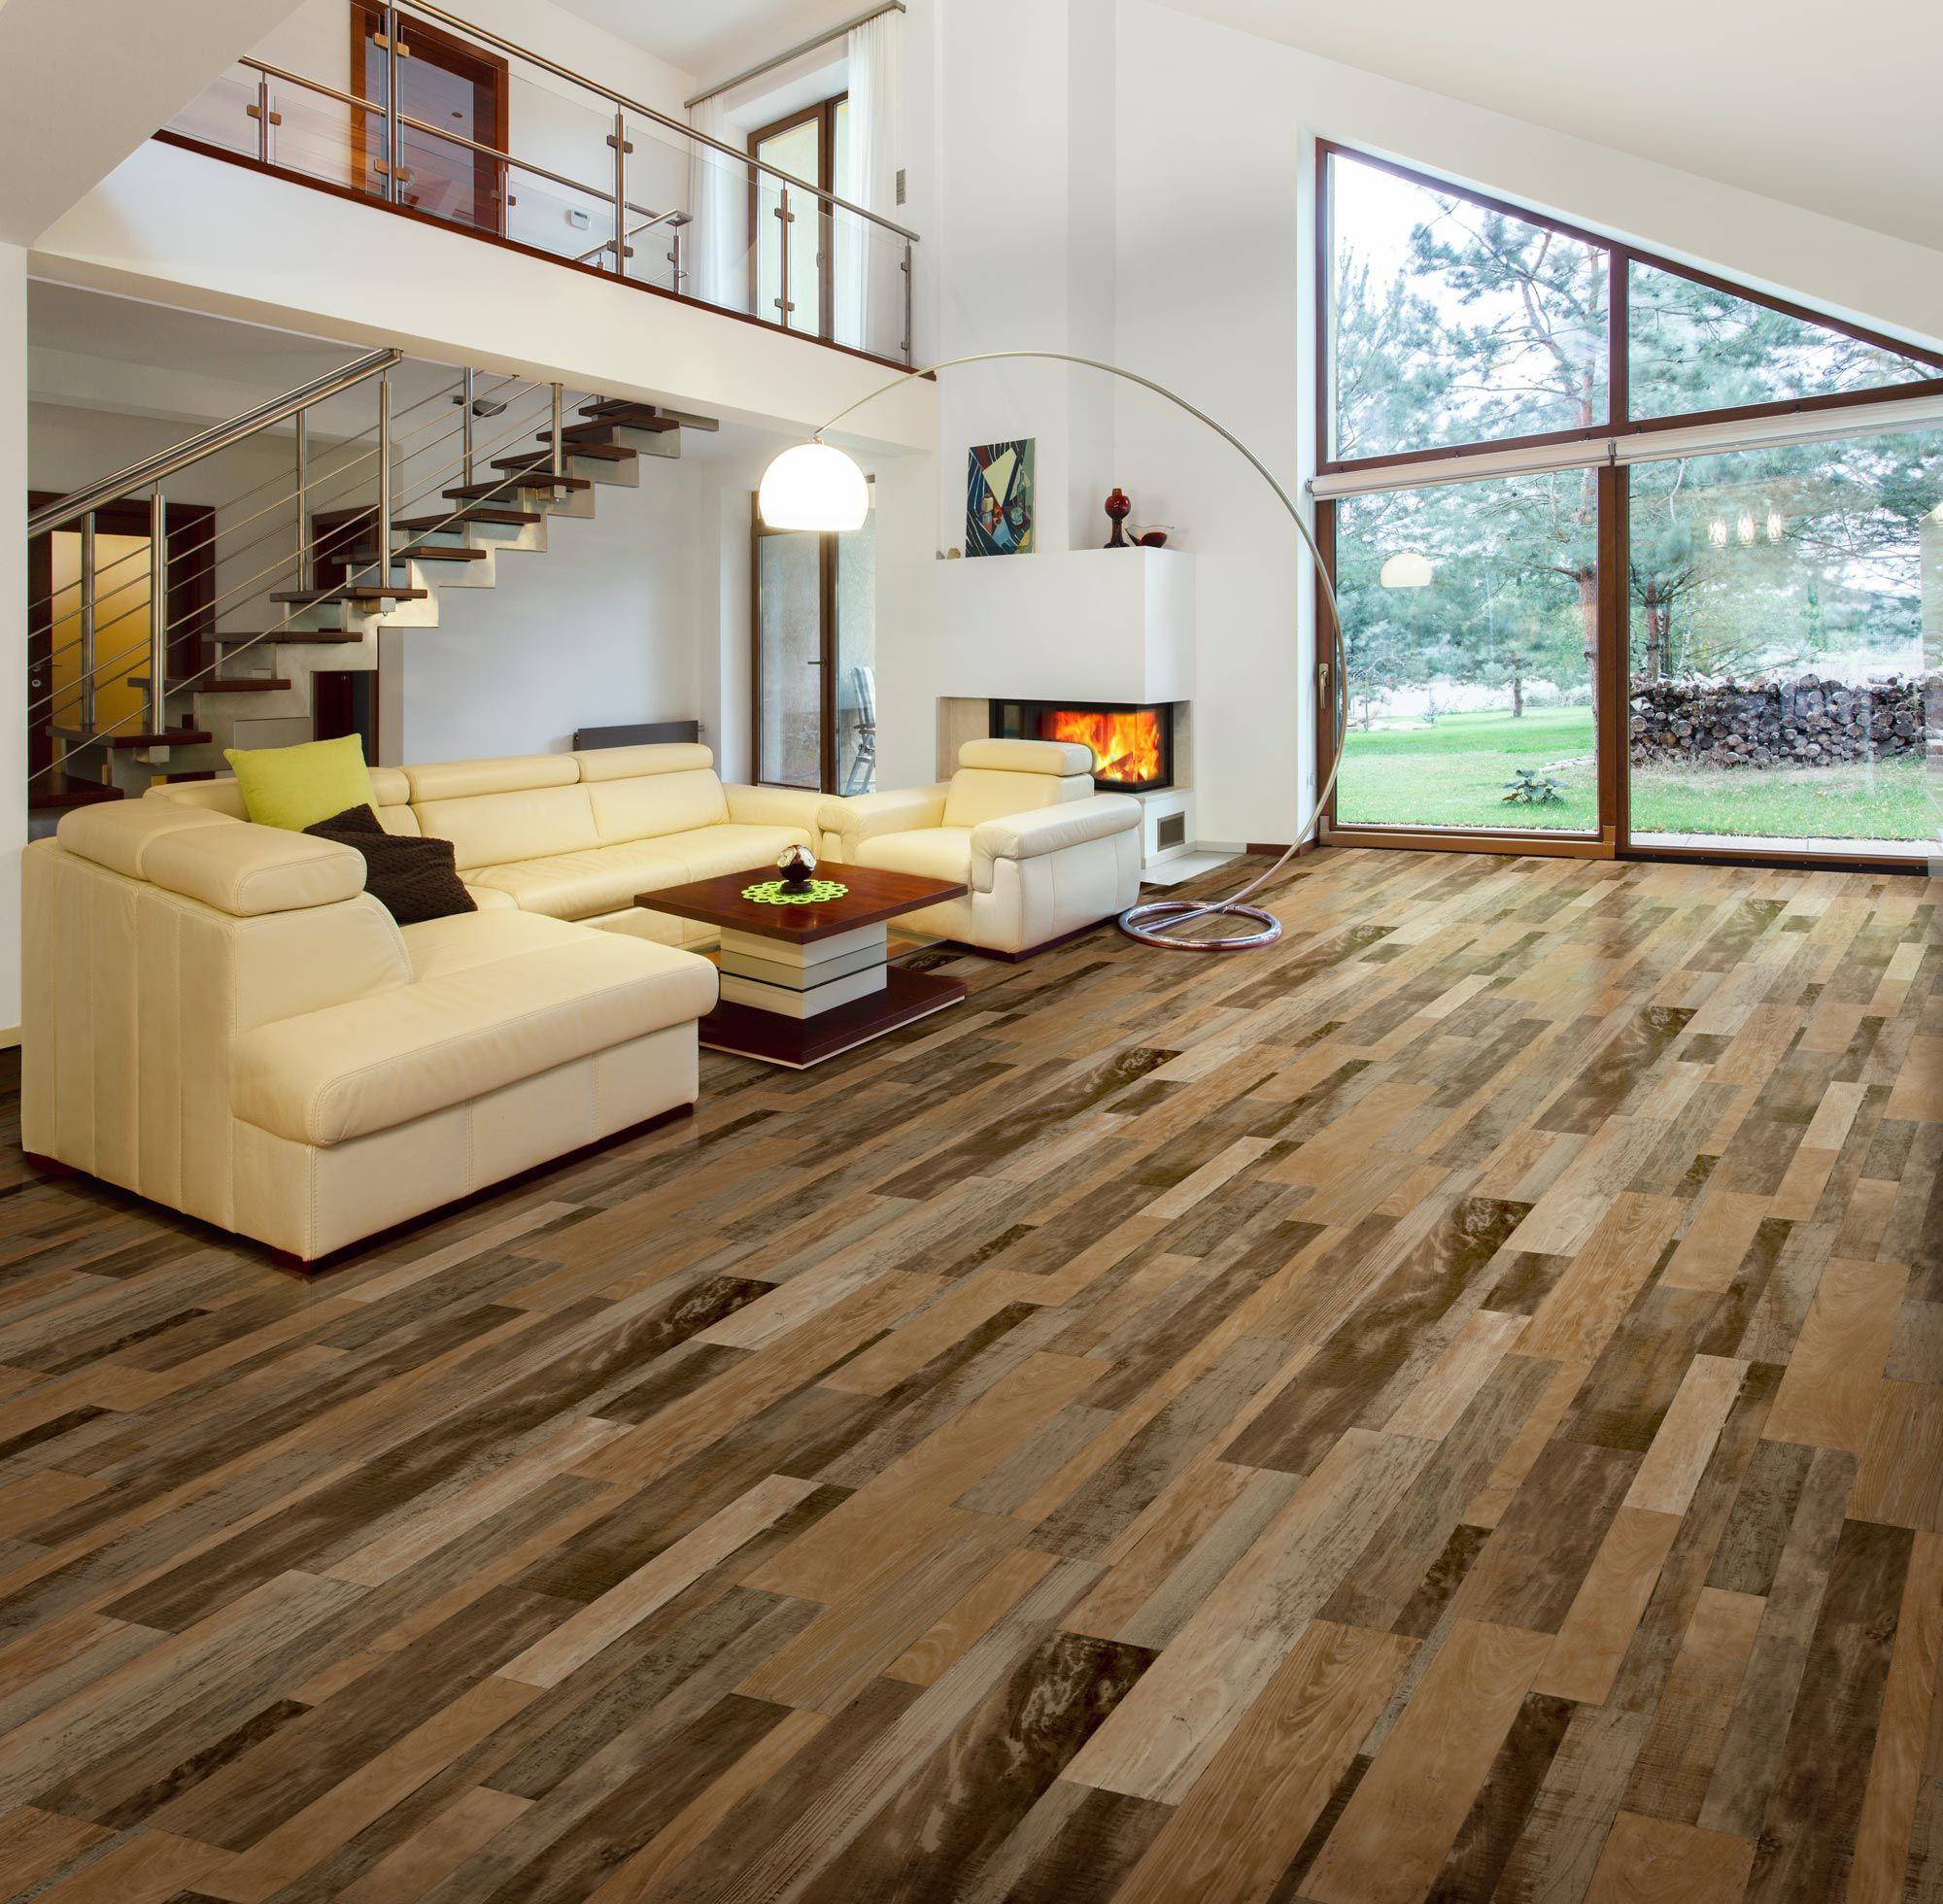 Airstep Advantage Curious Magic Trick Unique Flooring Luxury Sheets Home